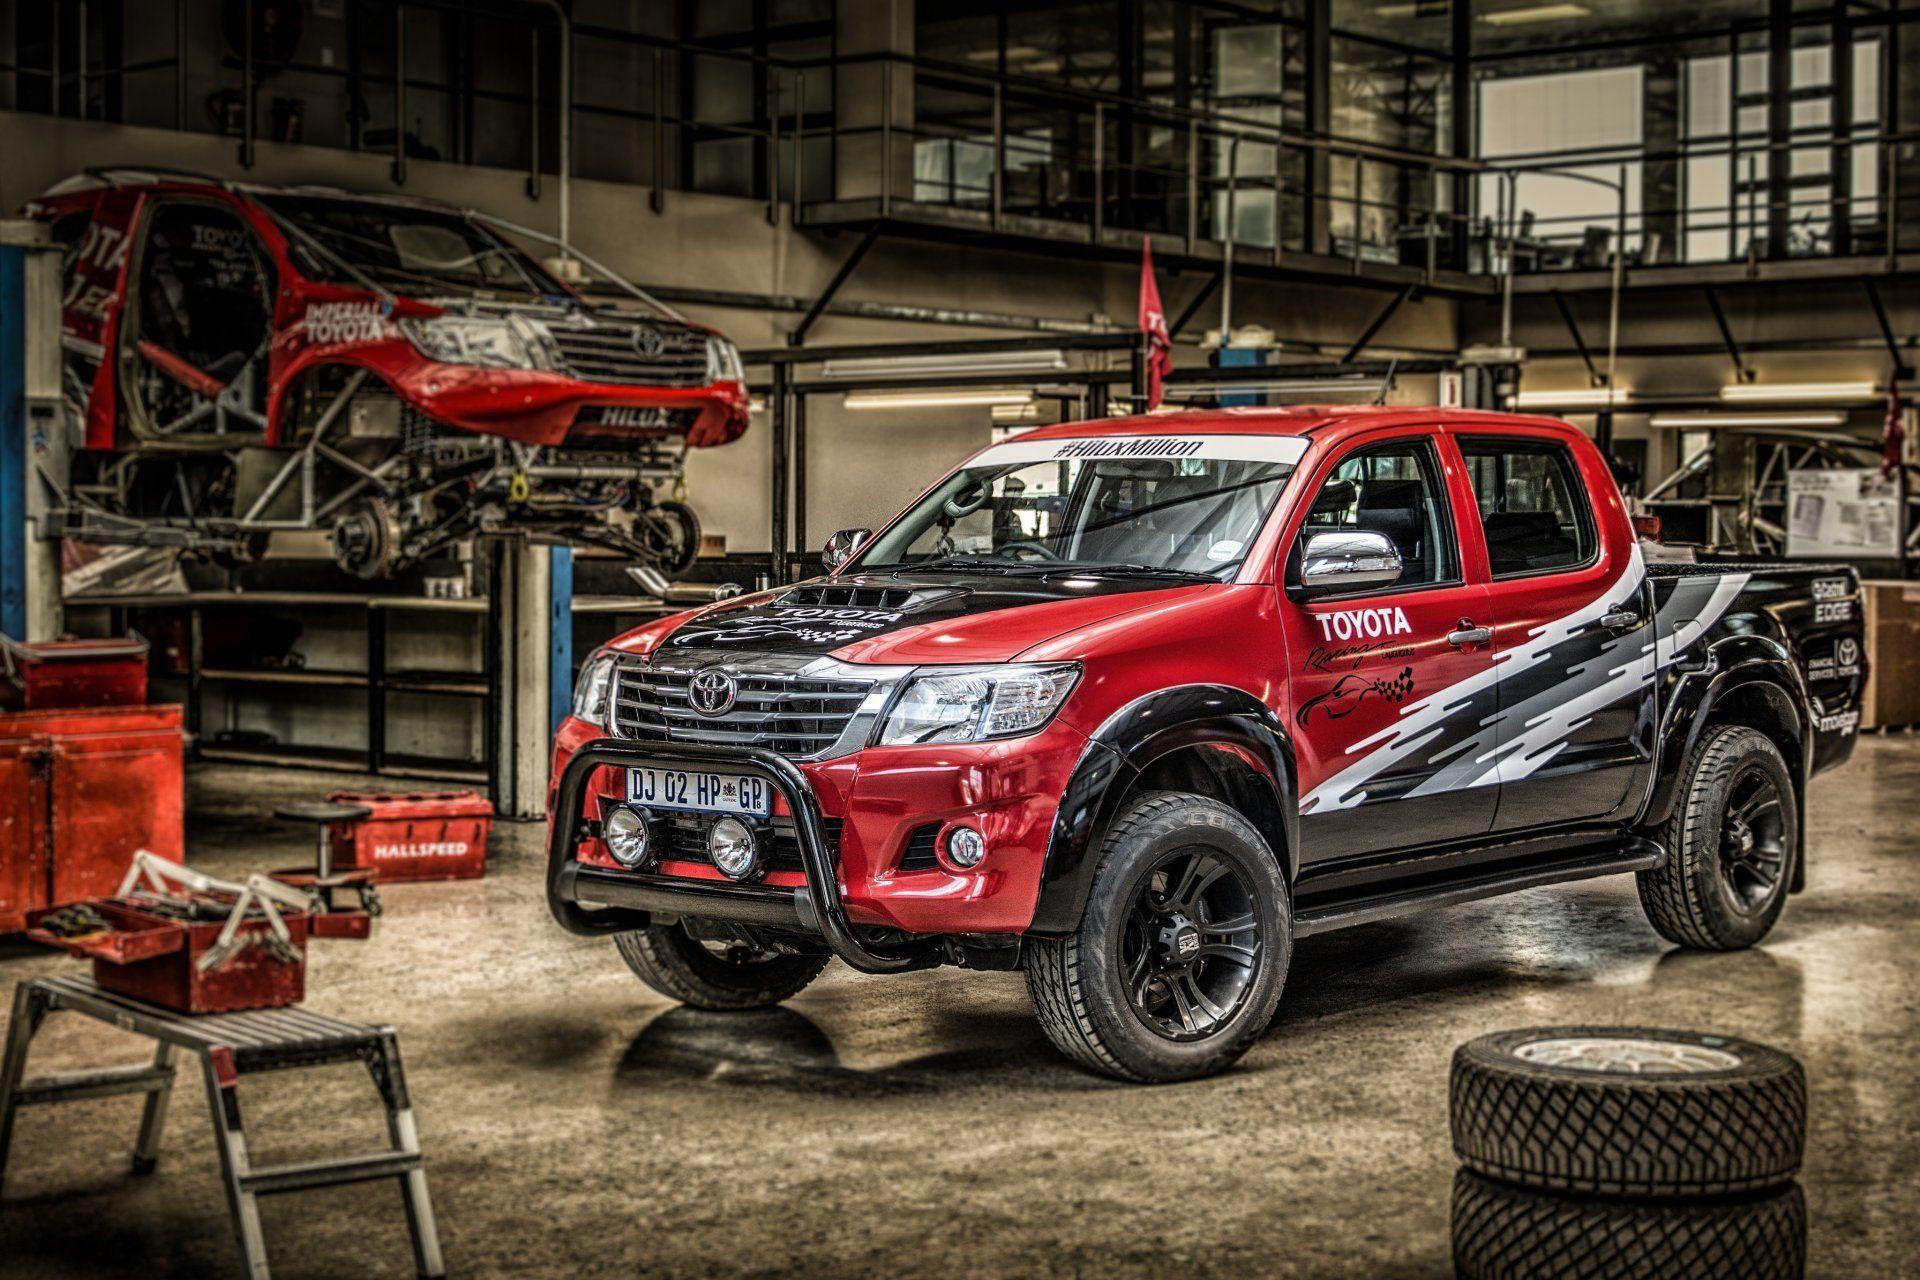 2015 Toyota Hilux Toyota Hilux Truck Hd Wallpaper   Toyota Hilux 1920x1280